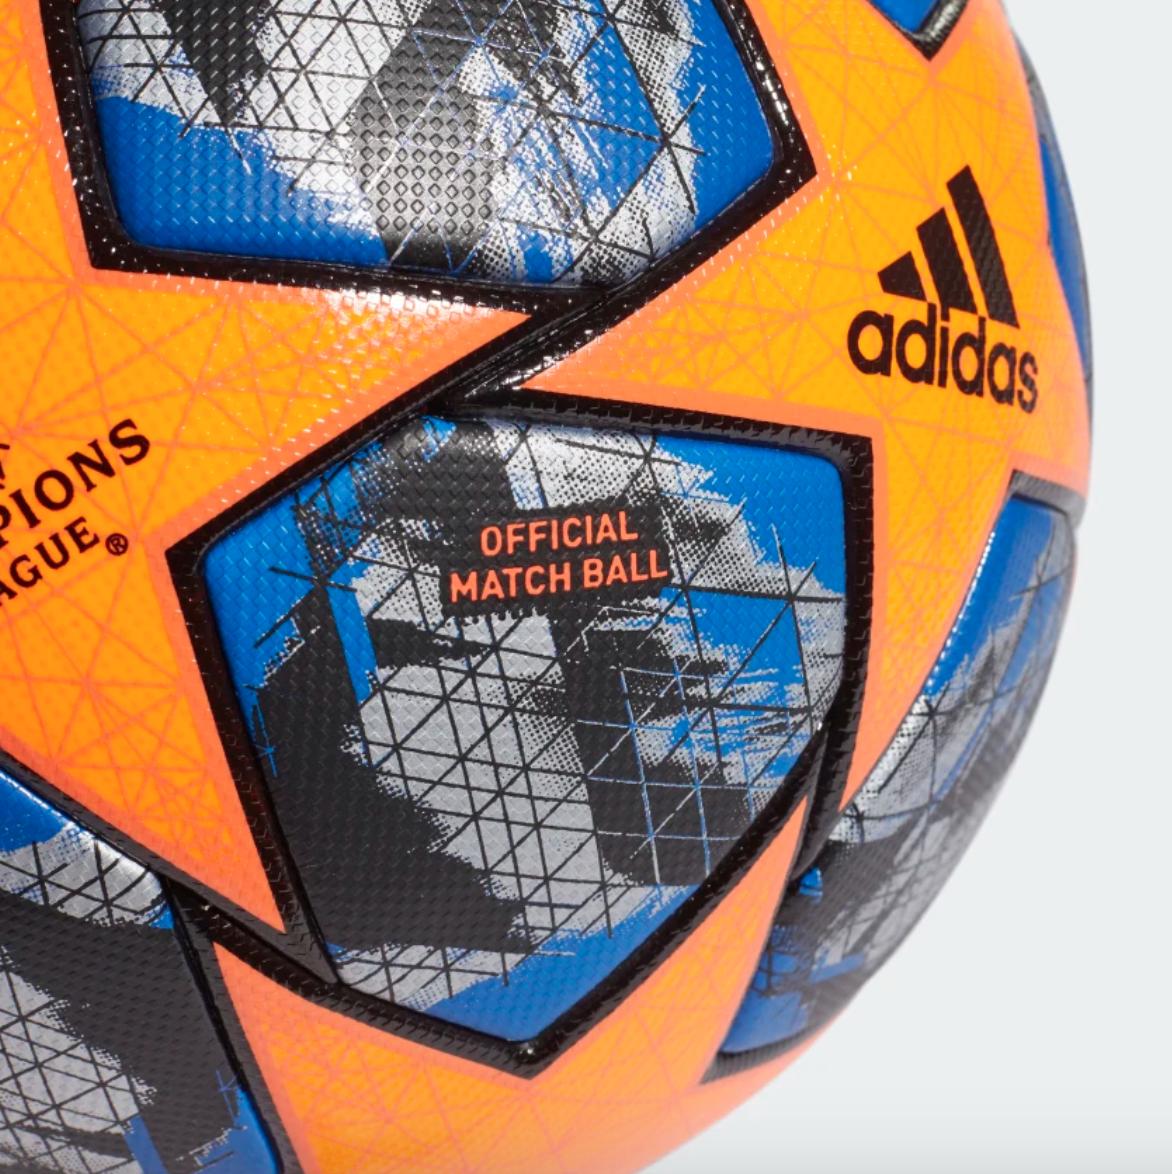 ballon-hiver-ligue-des-champions-2019-2020-adidas-2